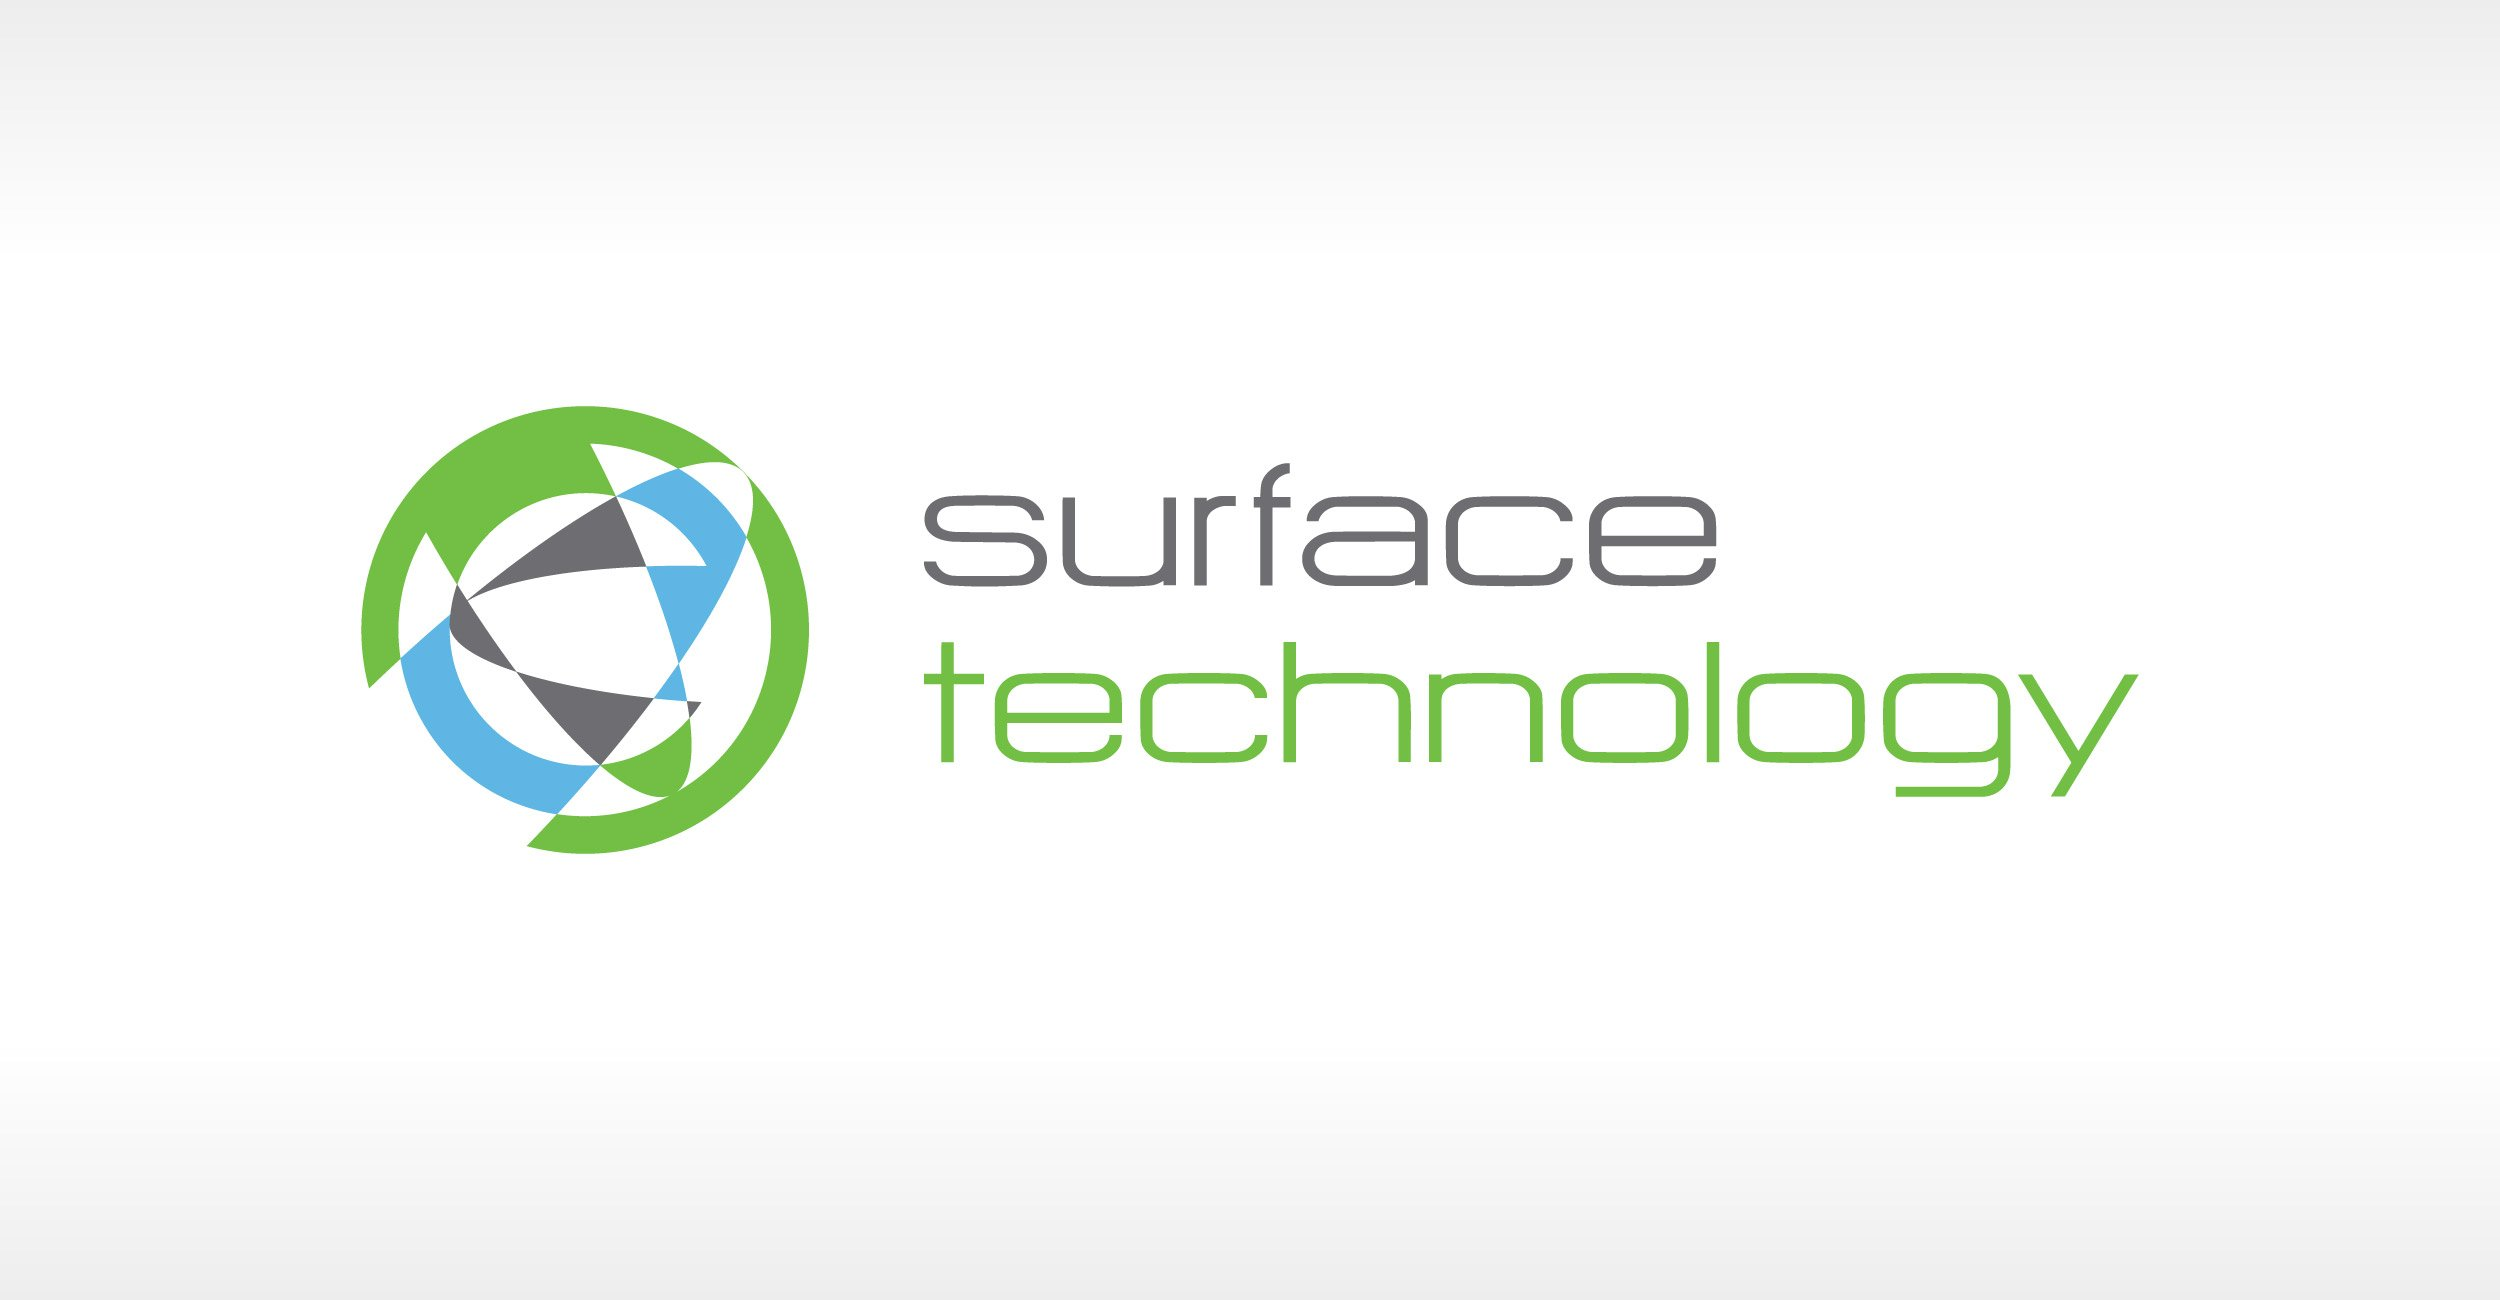 Surface Technology Brand Design